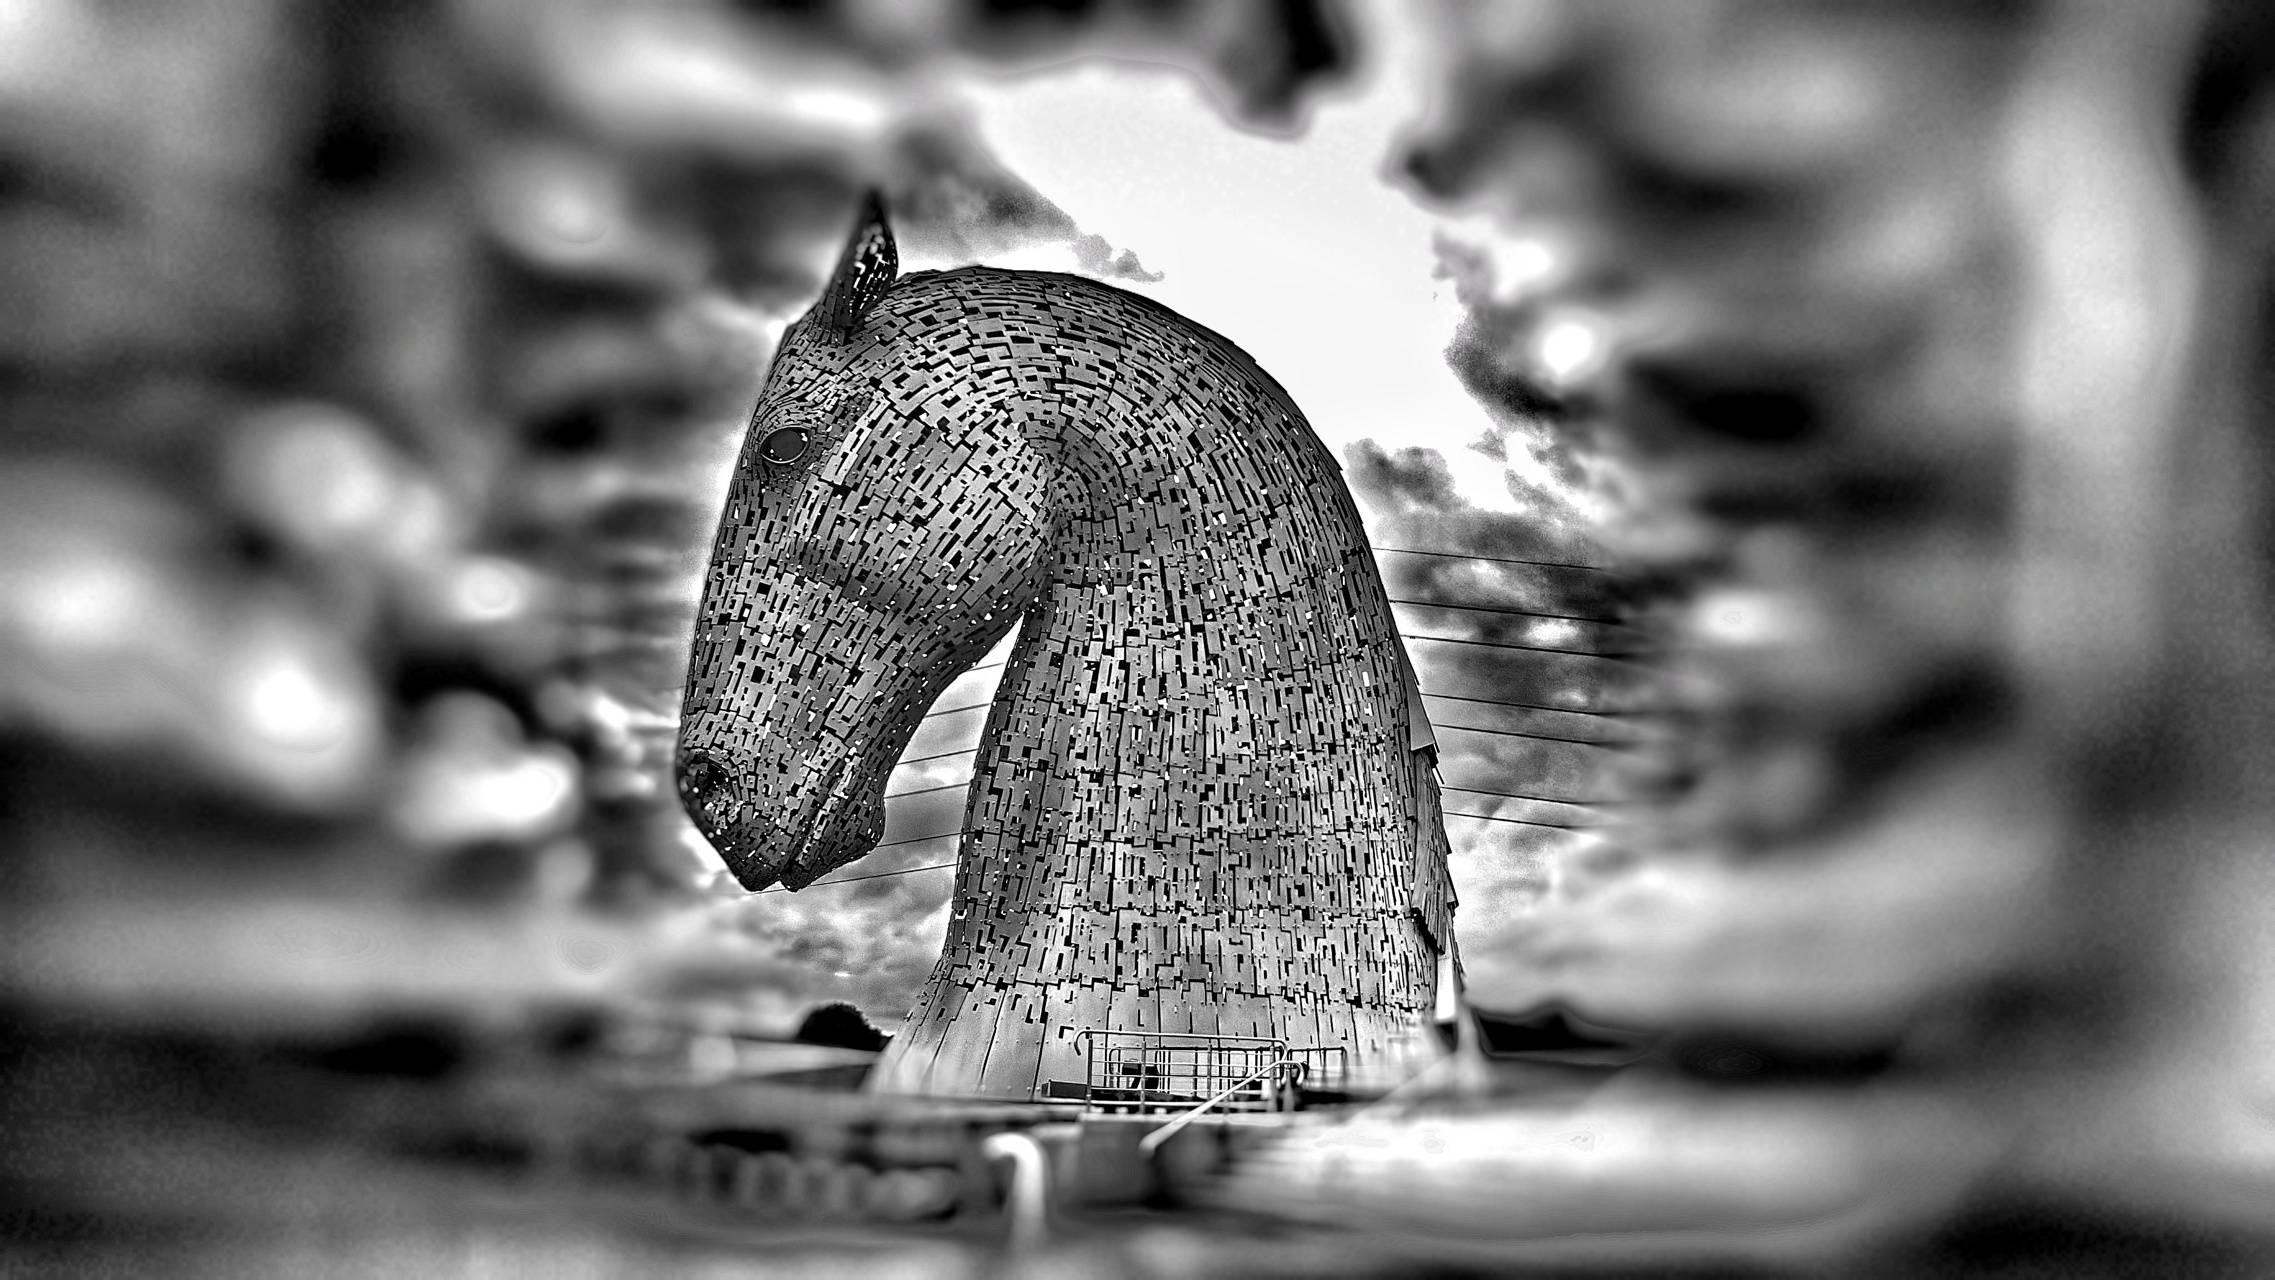 Horse of steele